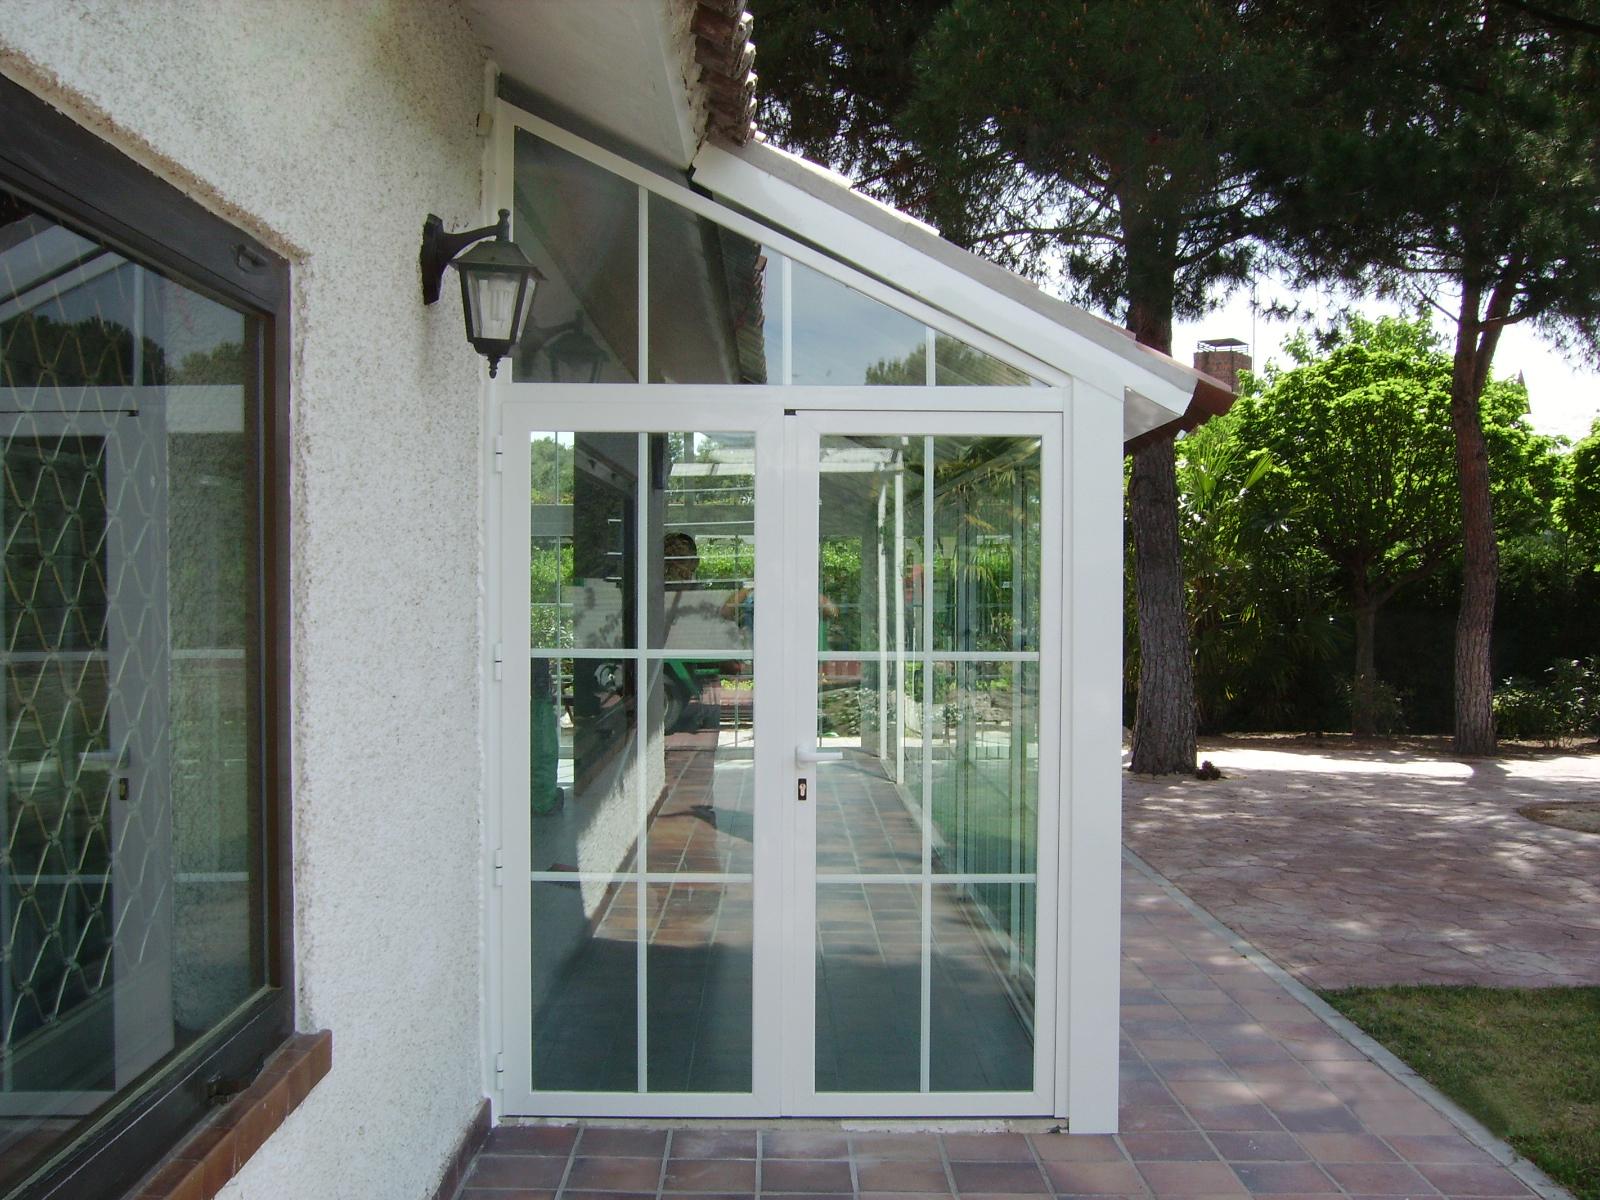 Cat logo de ventanas ventanas de pvc y ventanas de aluminio for Ventanales elevables